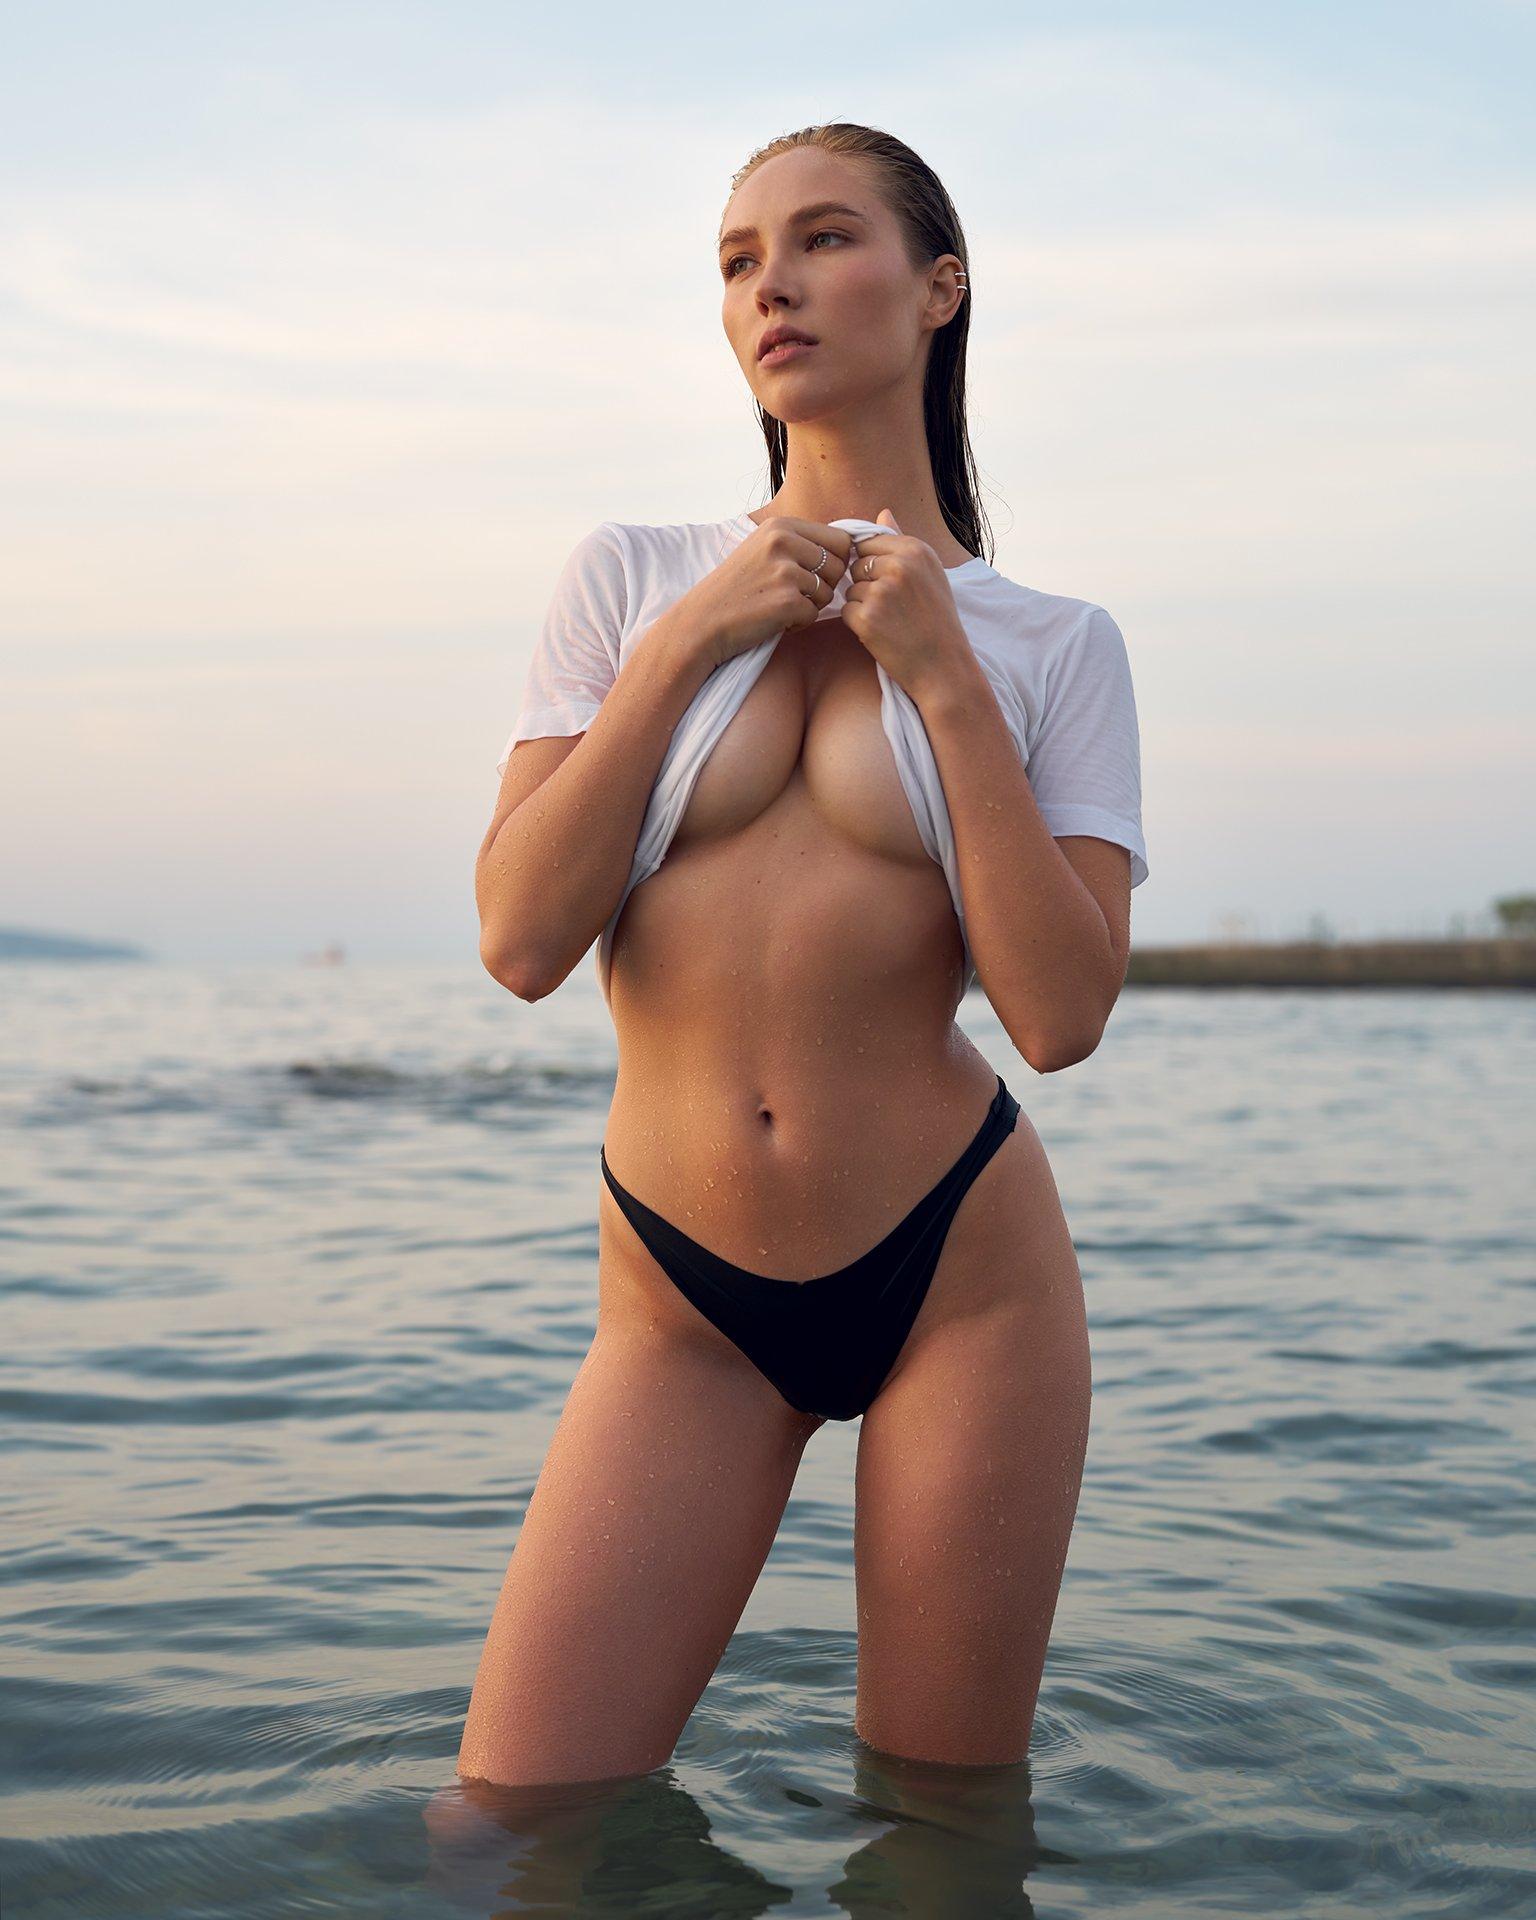 sea, novorossiysk, girl, portrait, wet, dawn, sunrise, morning, sexy, Роман Филиппов